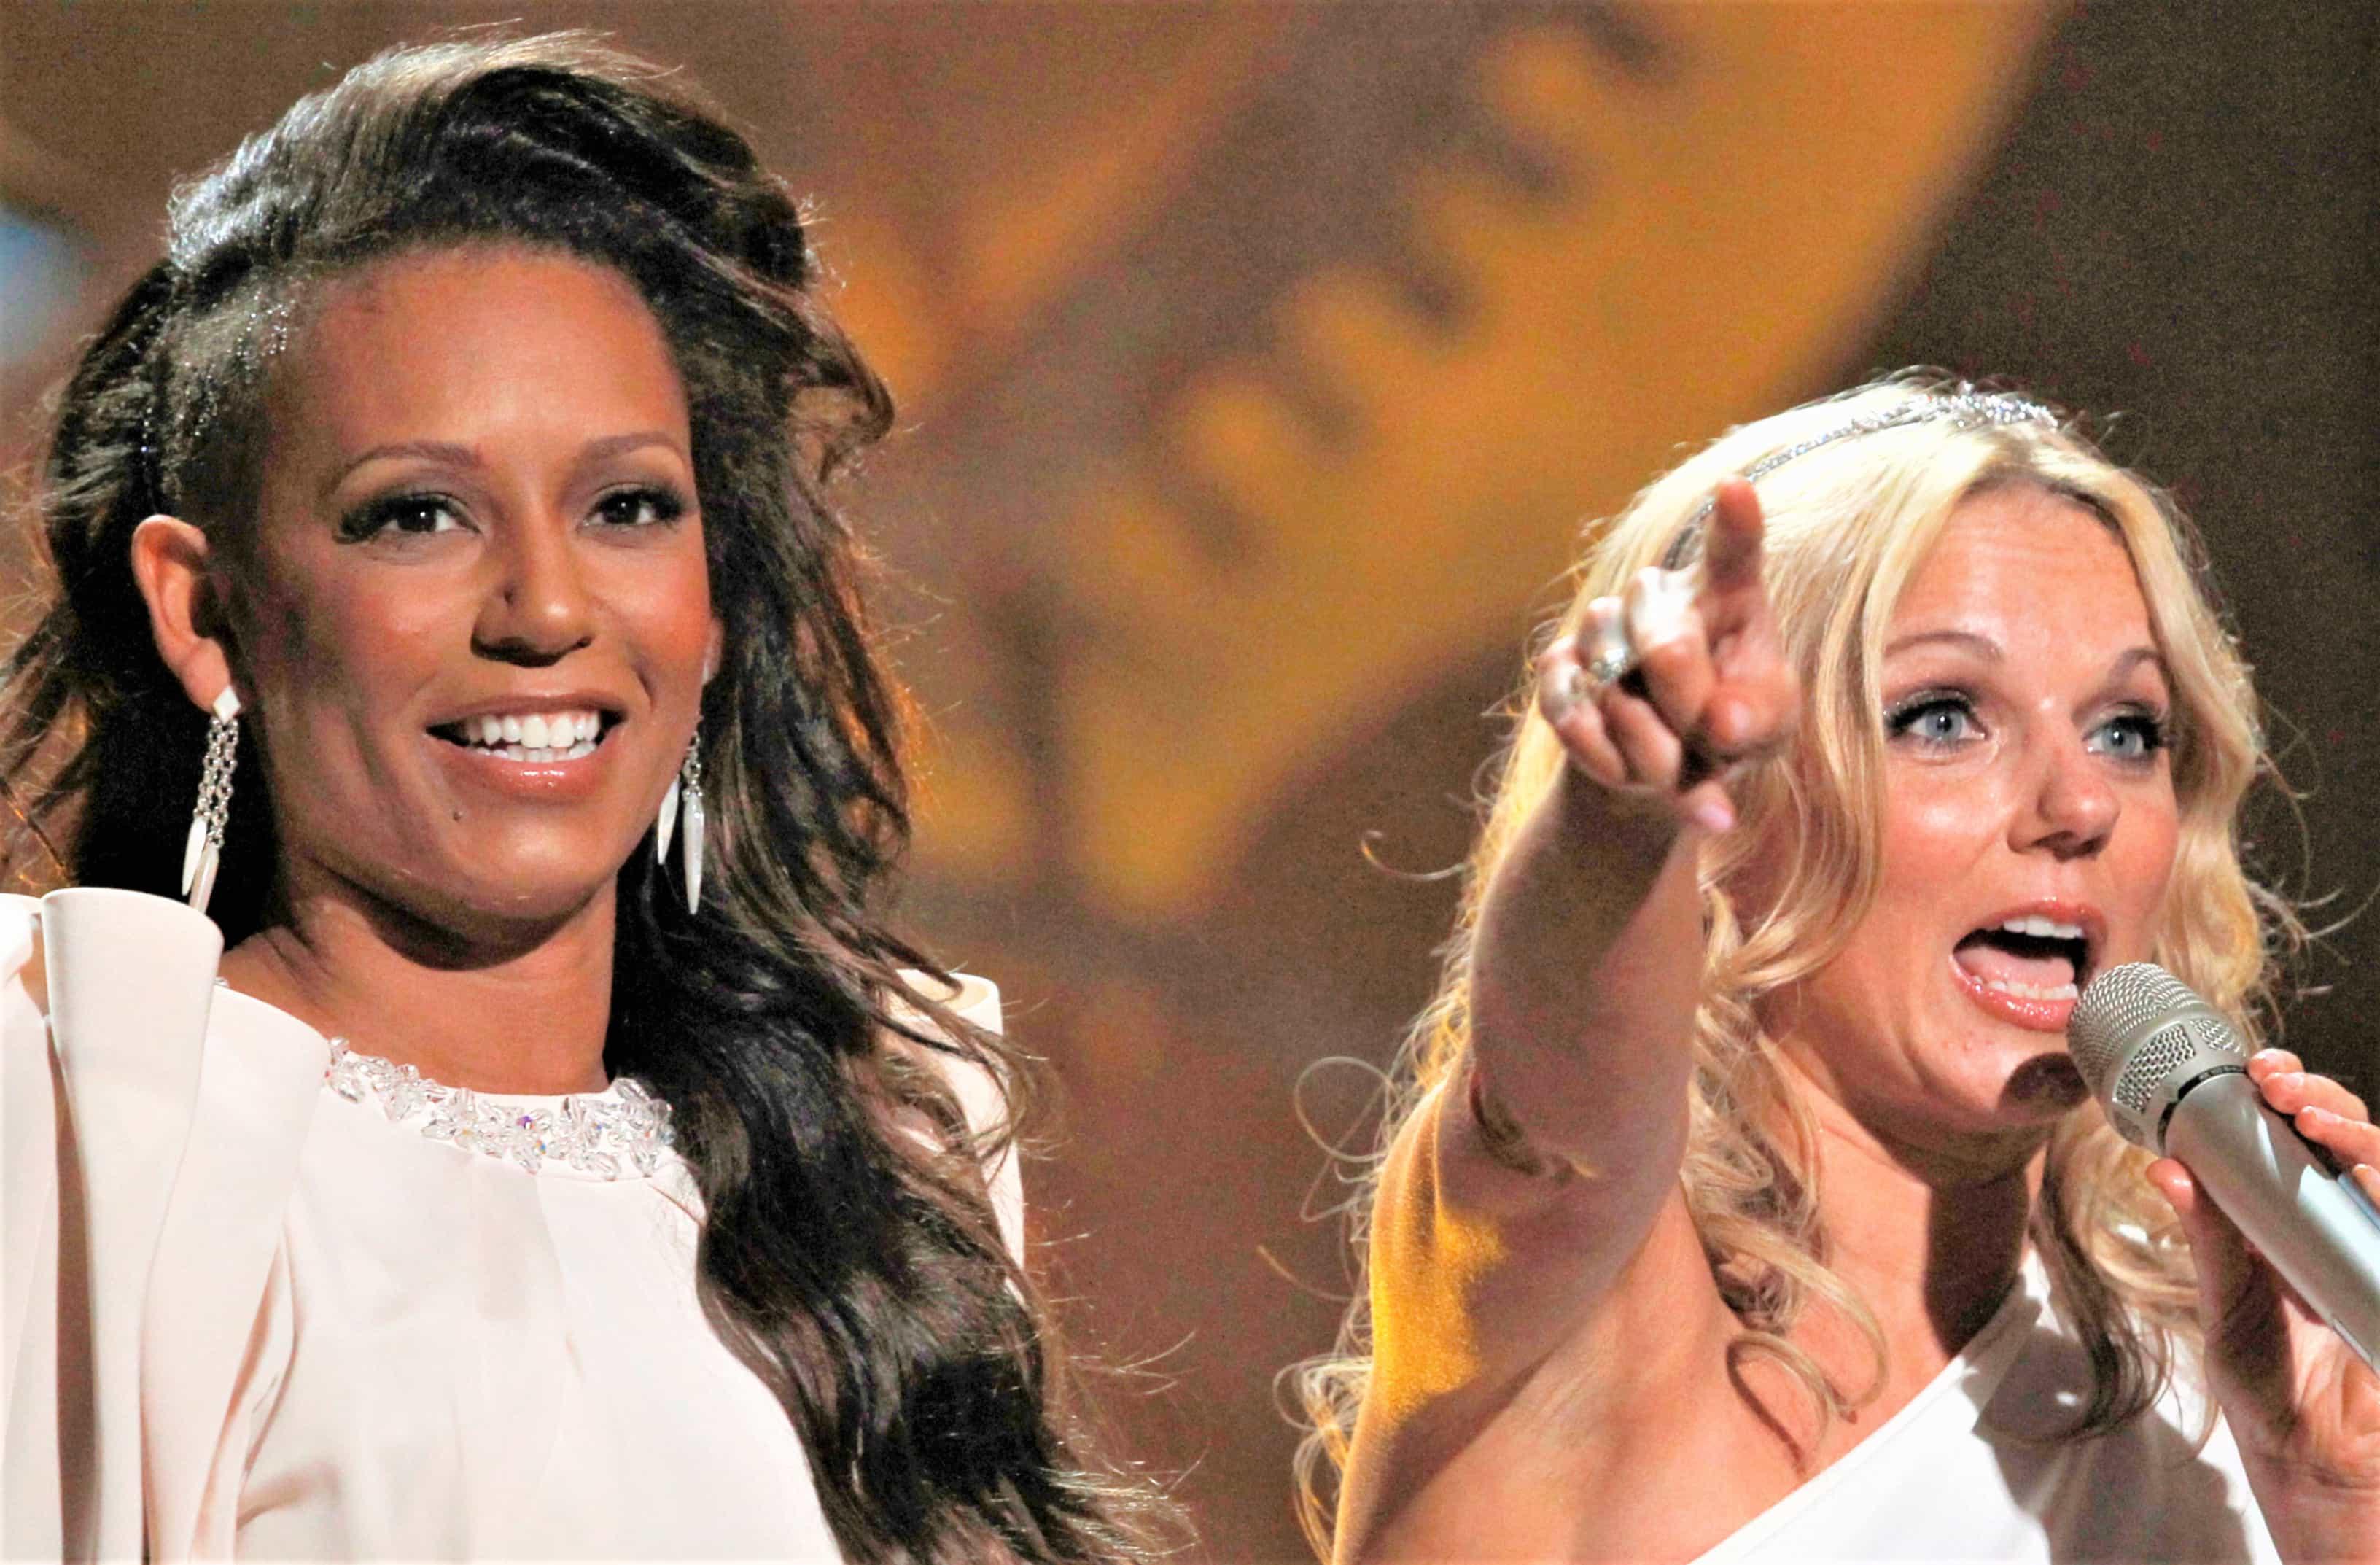 Spice Girls e outros envolvimentos icônicos de parceiros de bandas